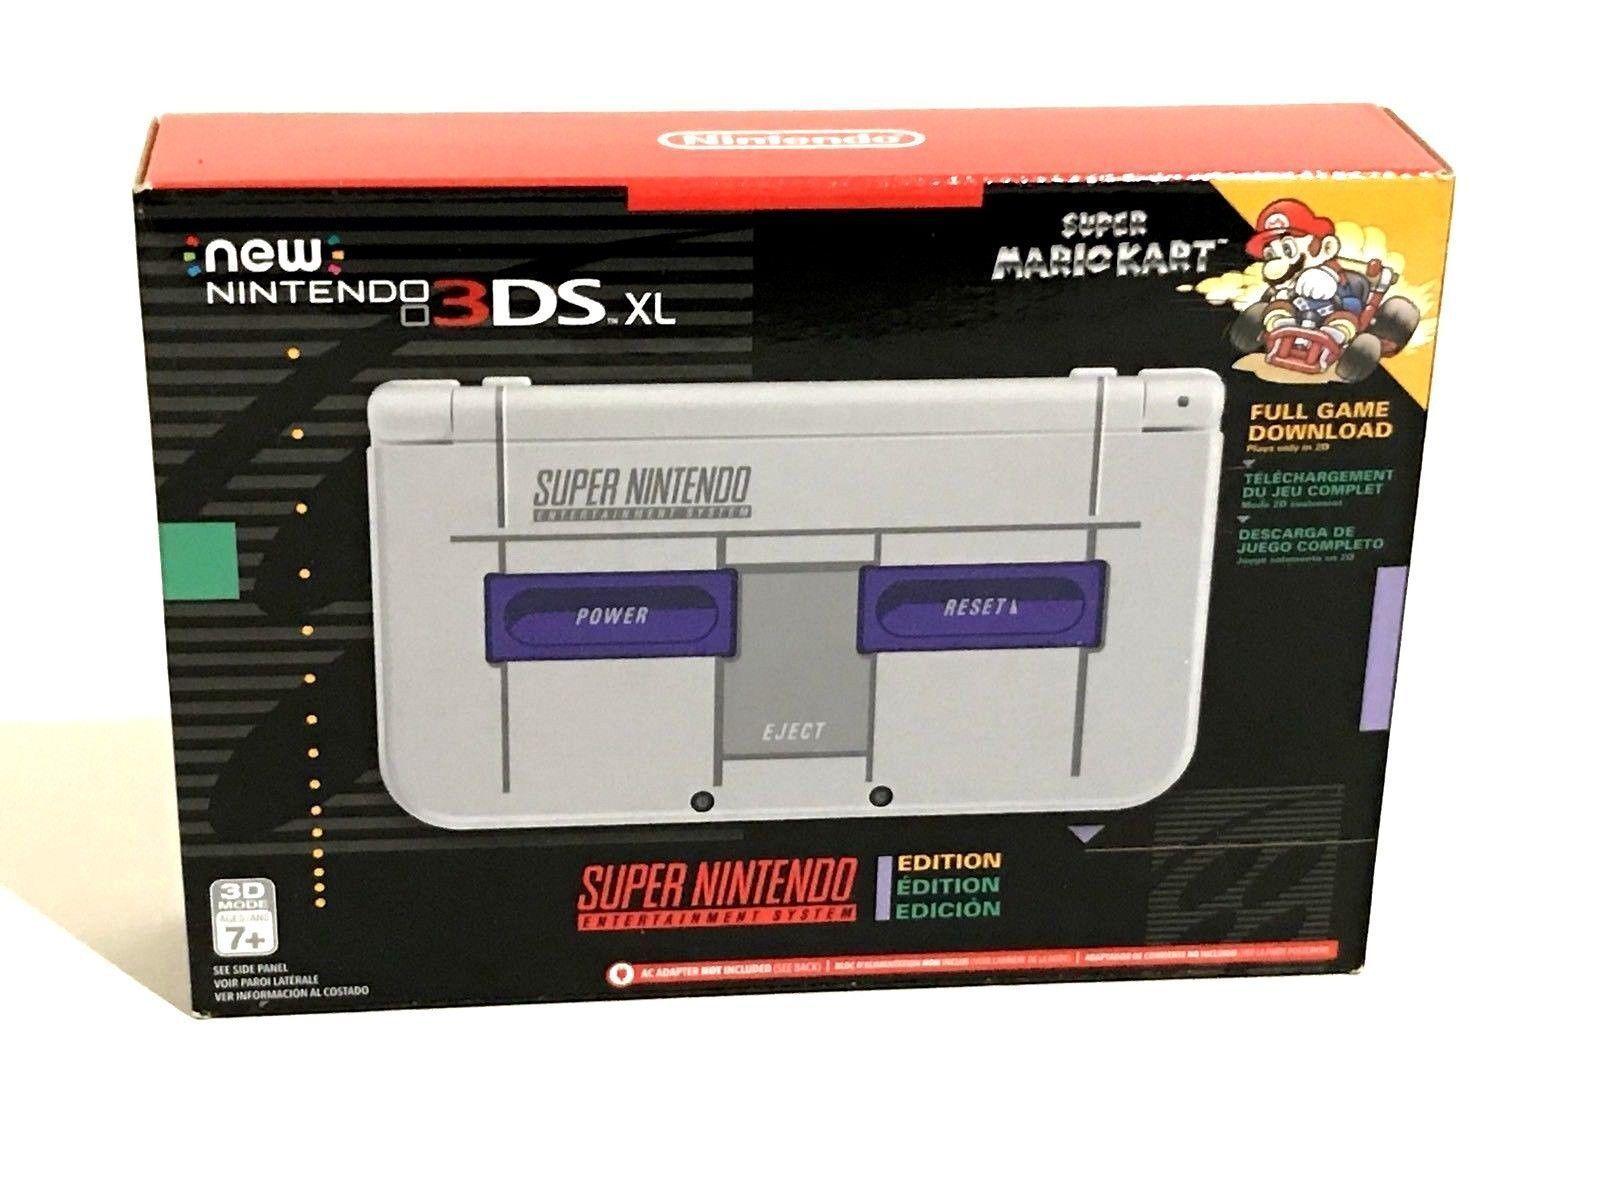 Nintendo NEW 3DS XL Super Nintendo NES Limited Edition (Newest Model)